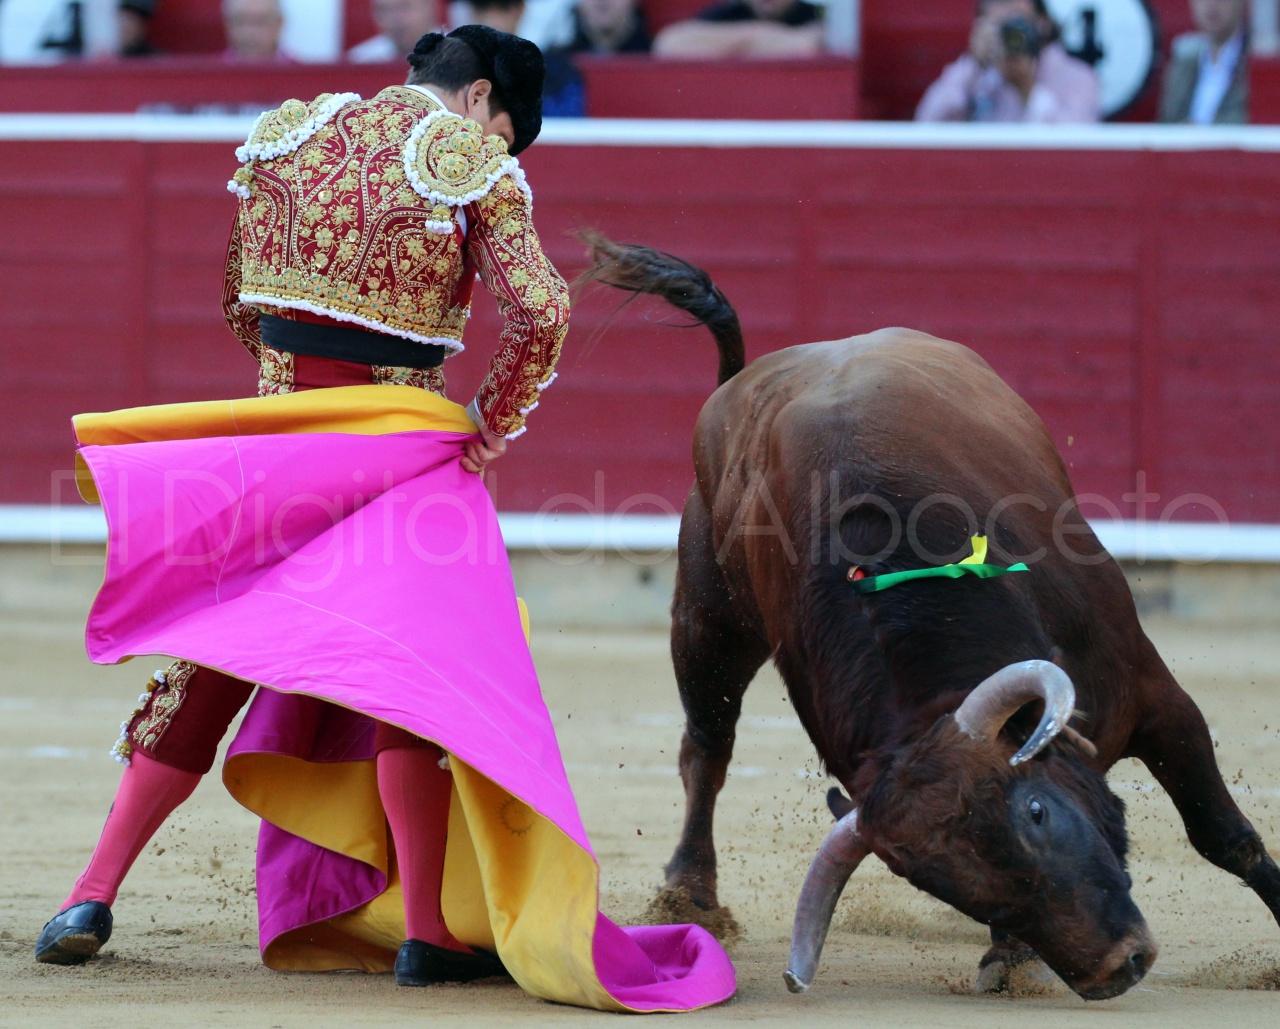 El Juli Lopez Simon y Garrido Feria Albacete 2015 toros  86